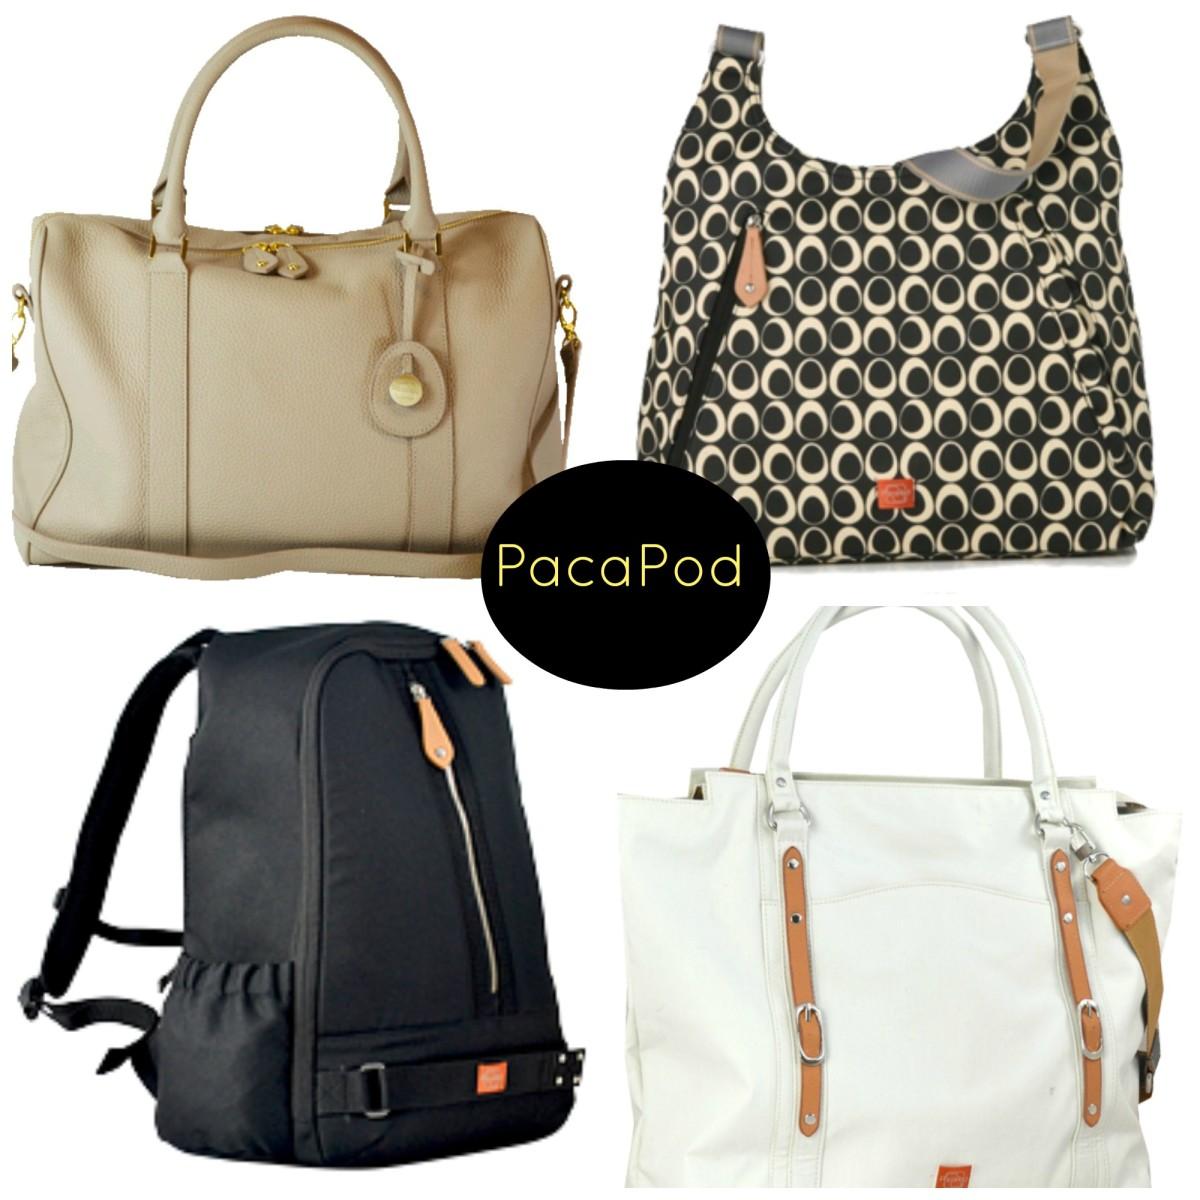 Pacapod Diaper Bags